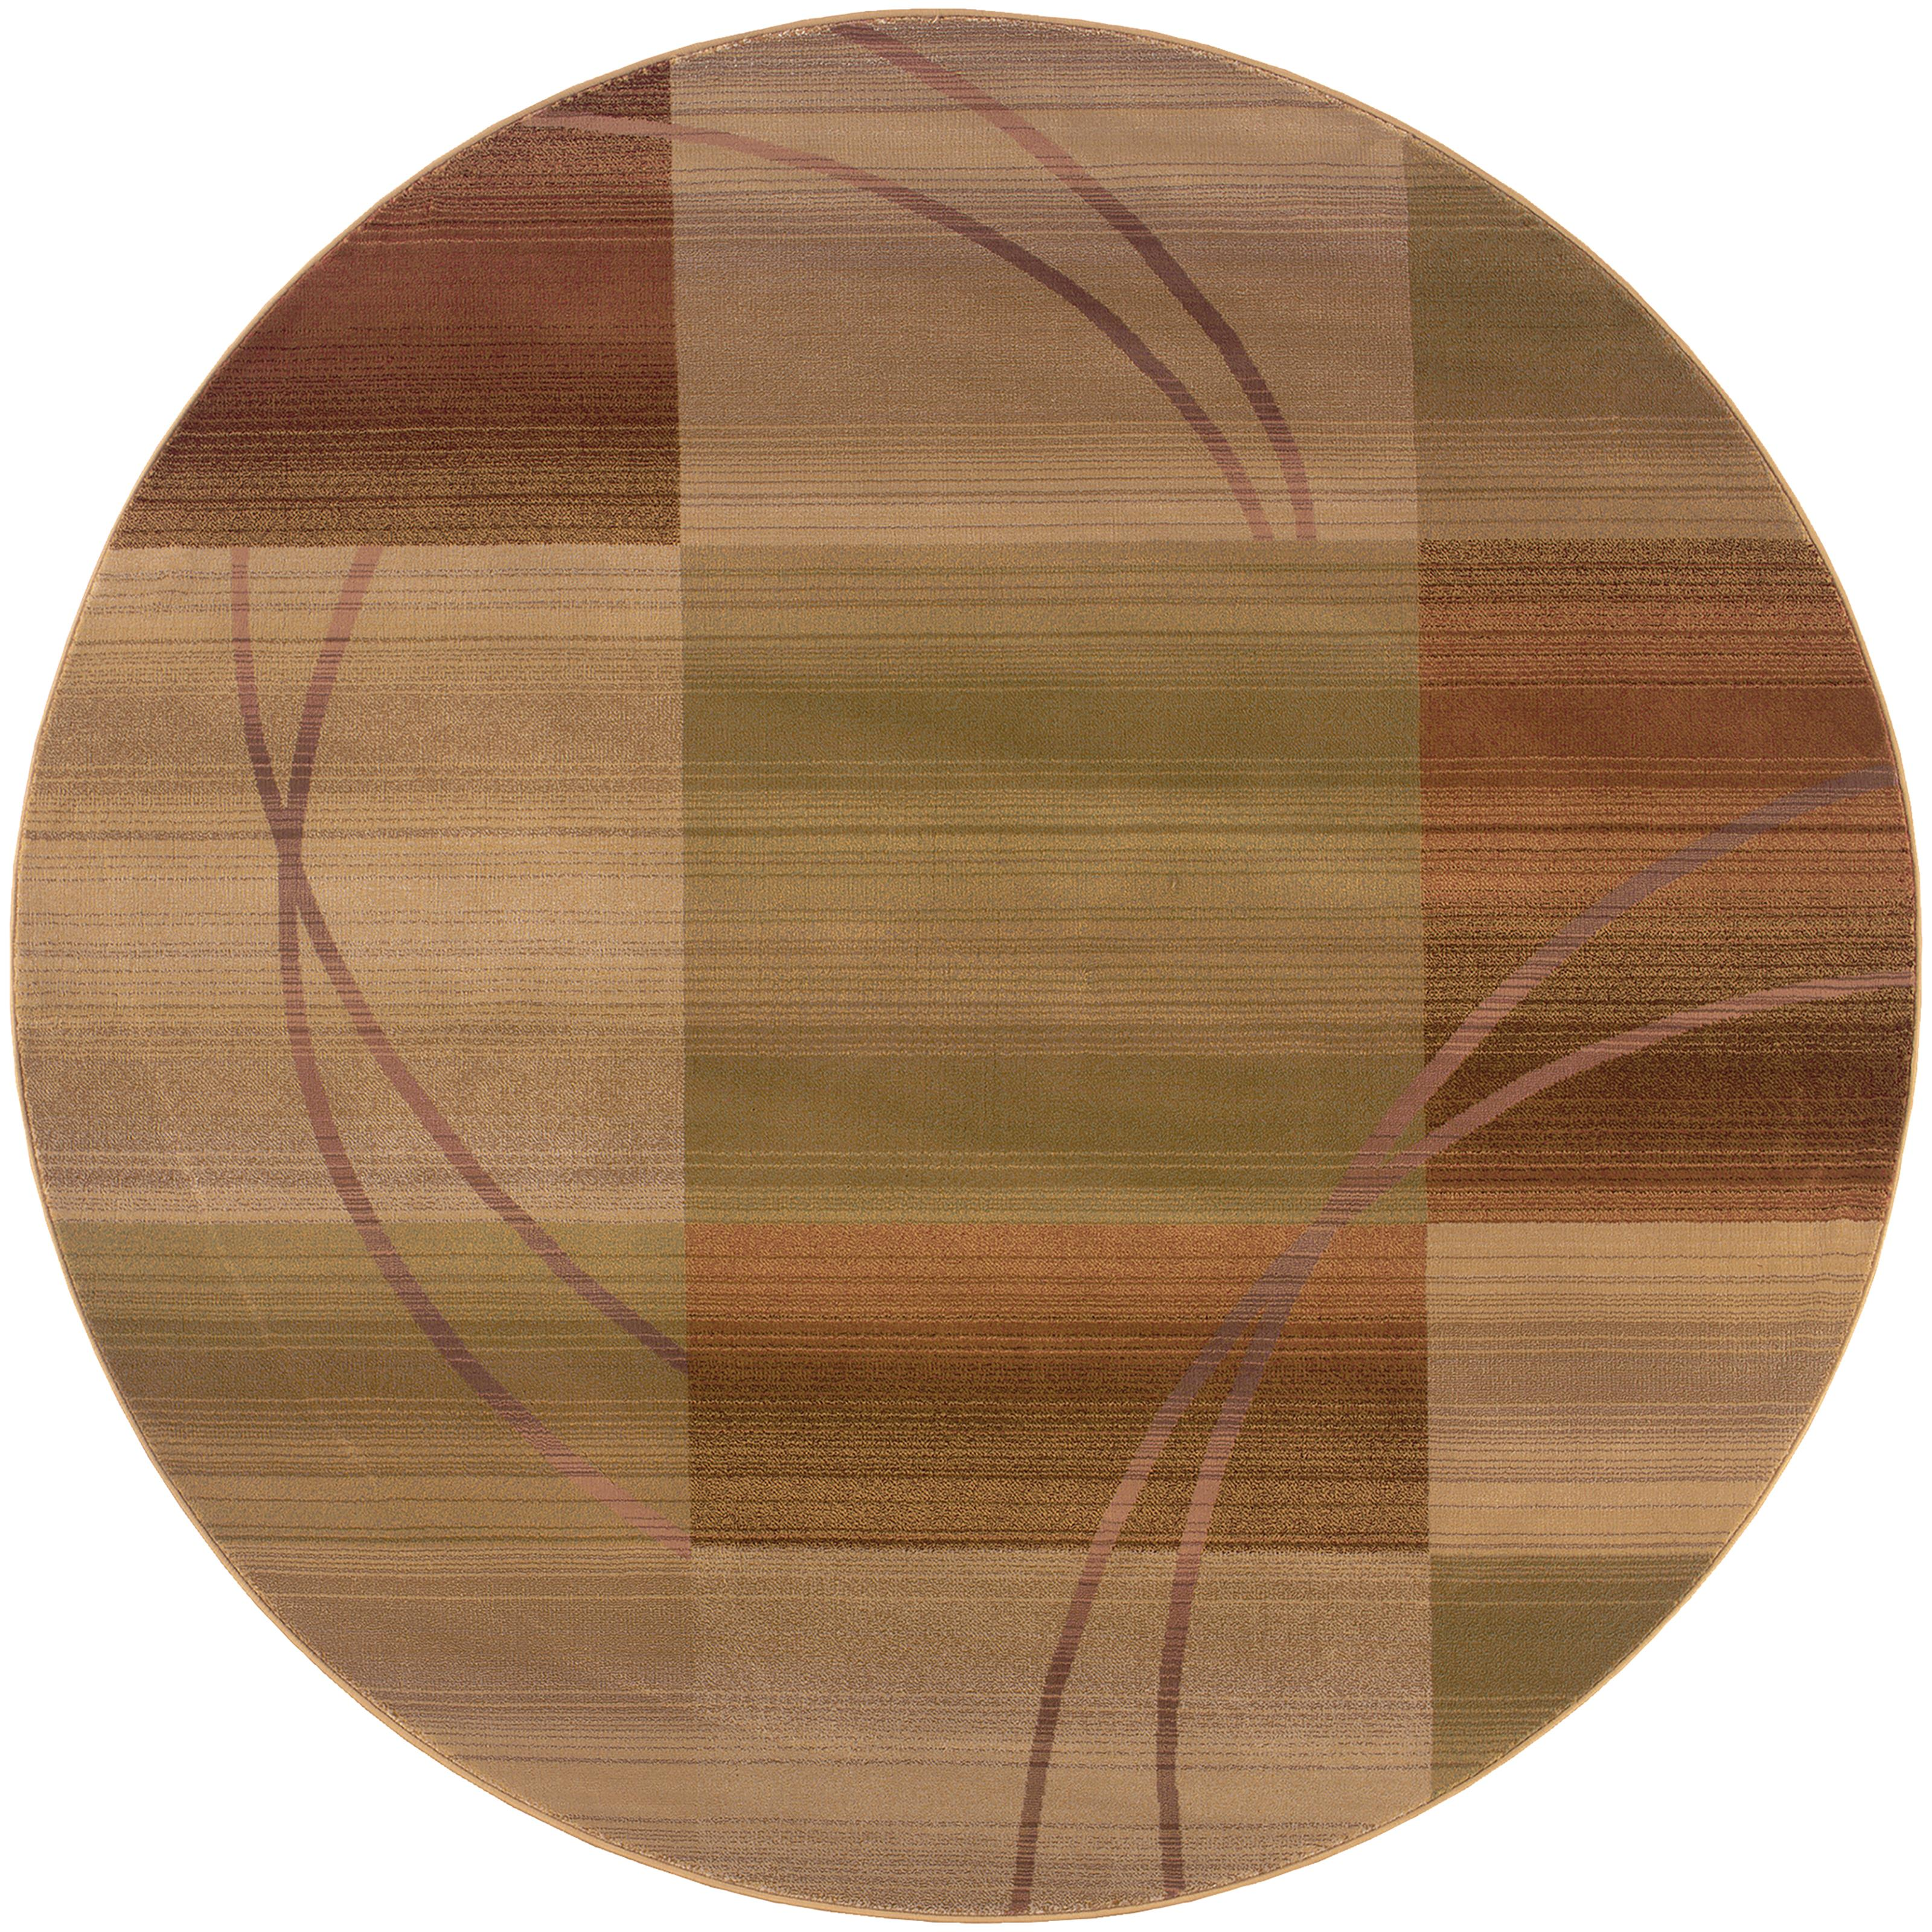 Oriental Weavers Generations 8' Rug - Item Number: G1608D240240ST